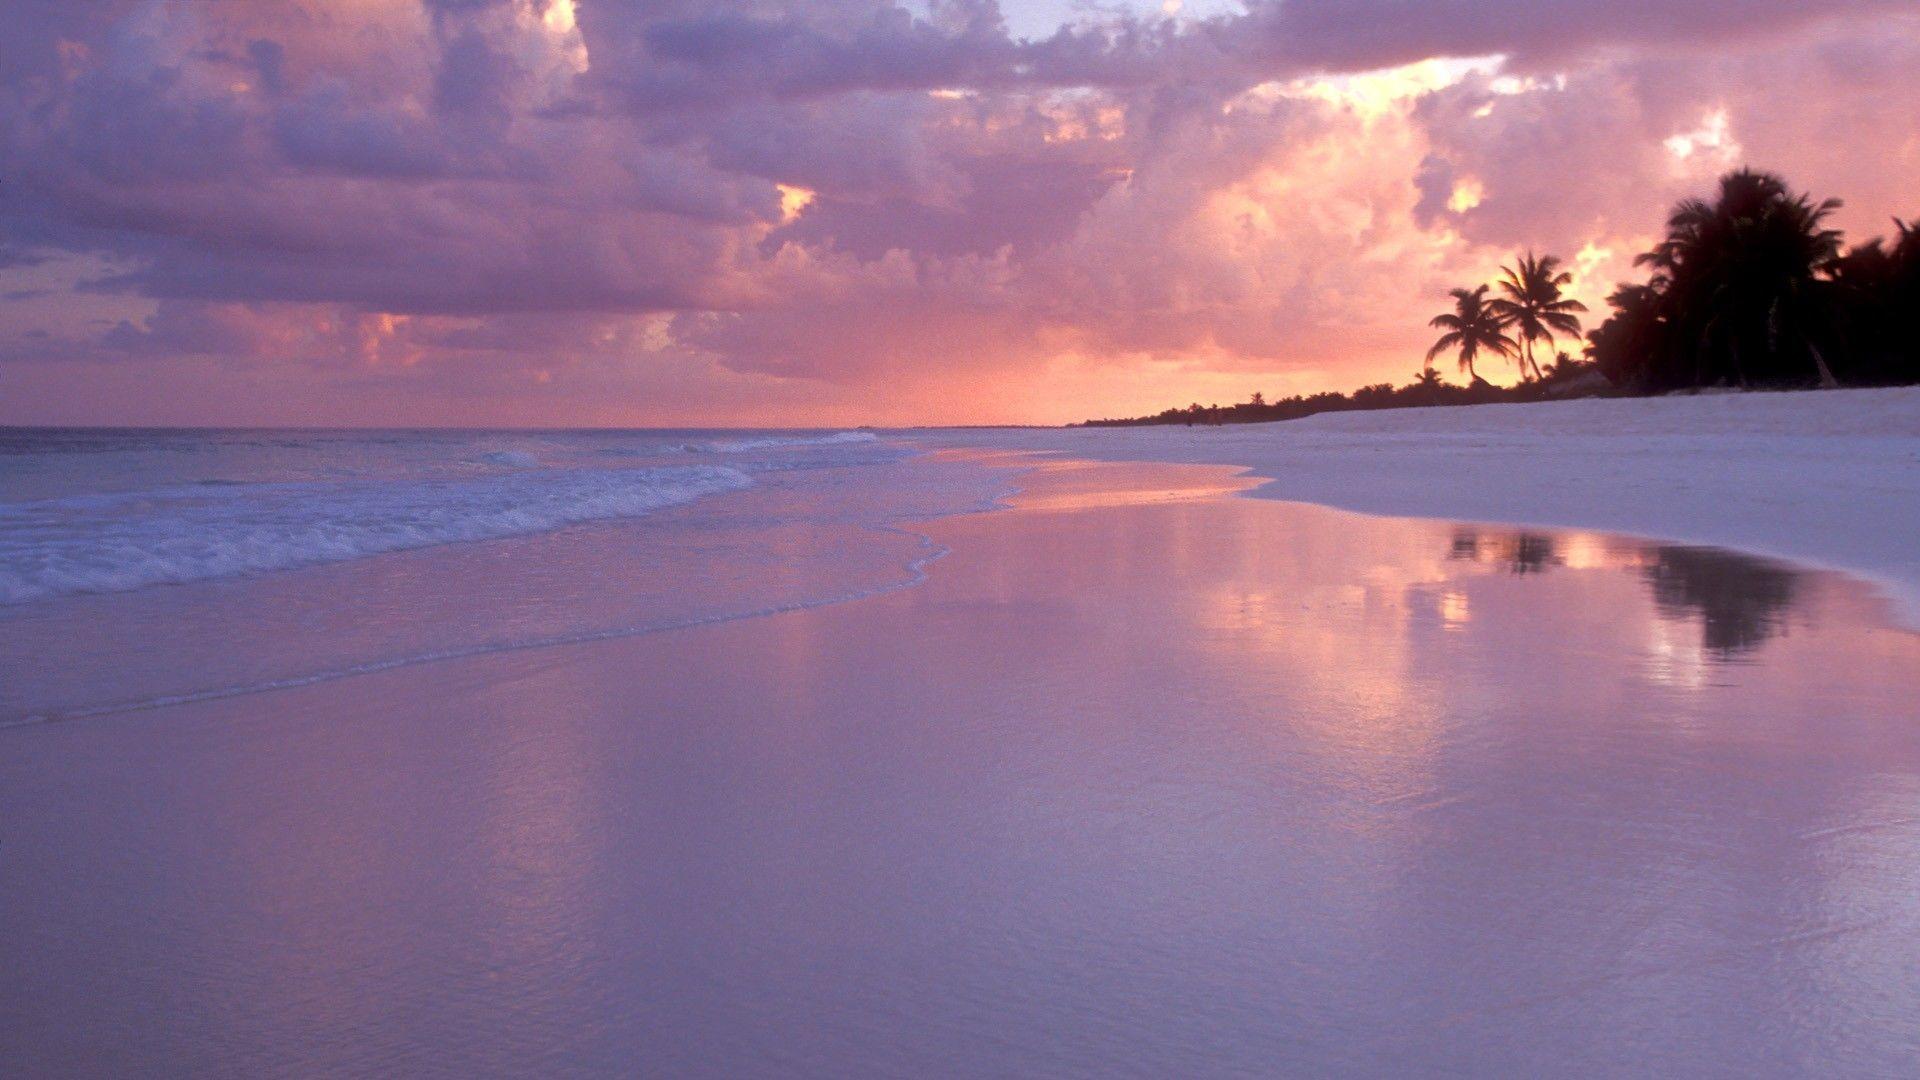 2560x1600 Twilight Island Beach Sunset